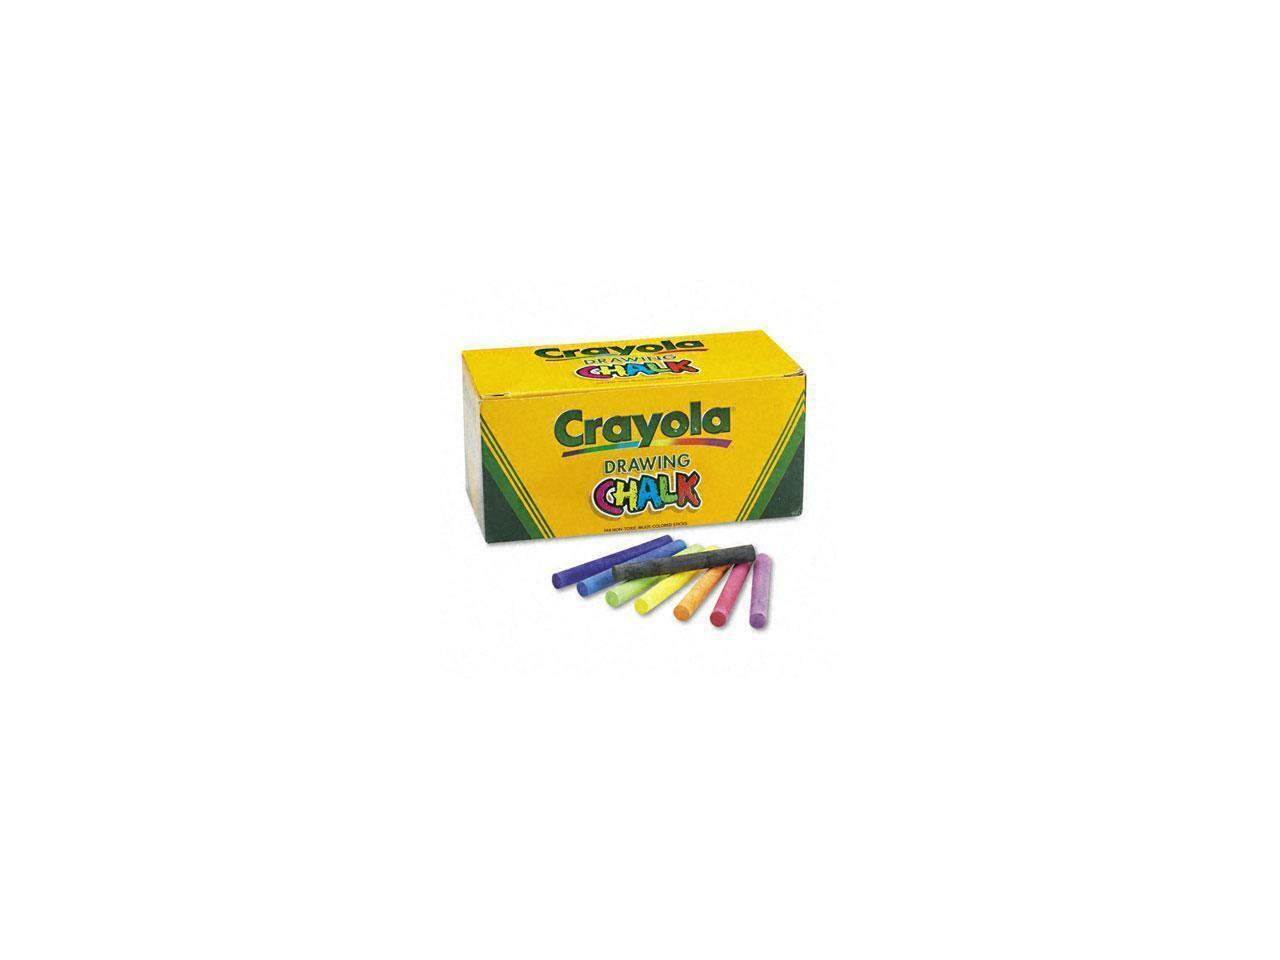 CYO510400 Crayola Colored Drawing Chalk